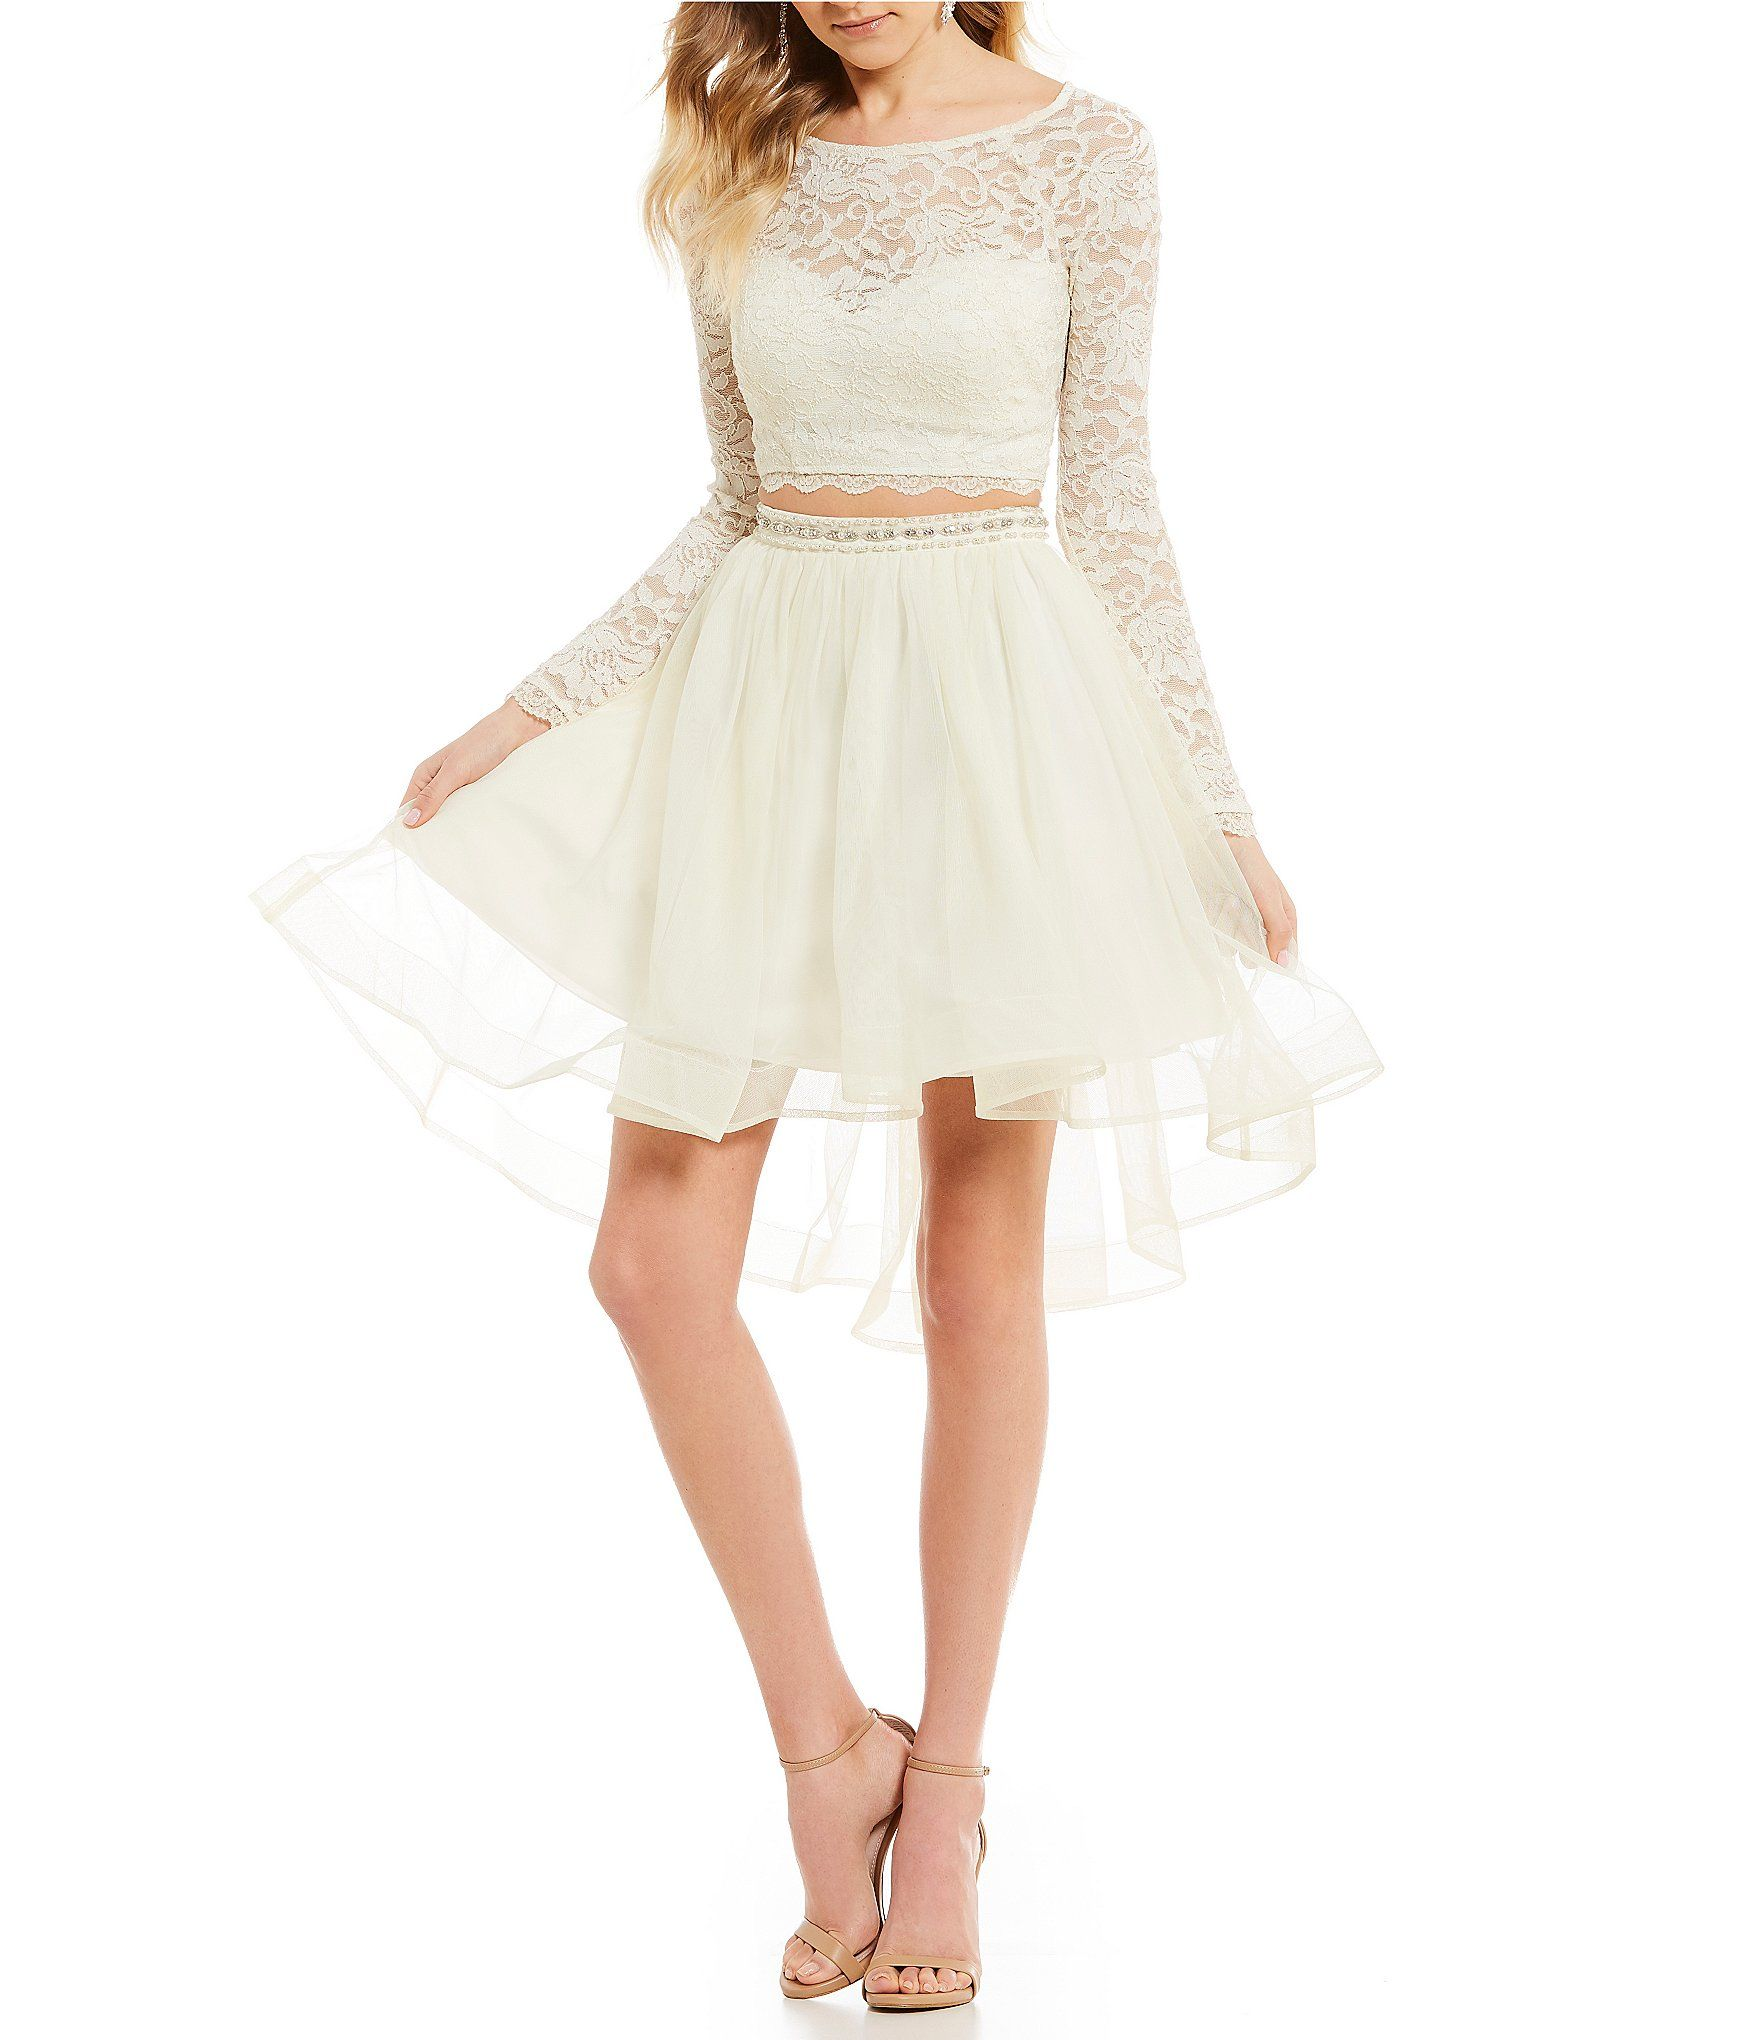 ea4ebeb5b28 Short Formal Dresses Dillards - Data Dynamic AG